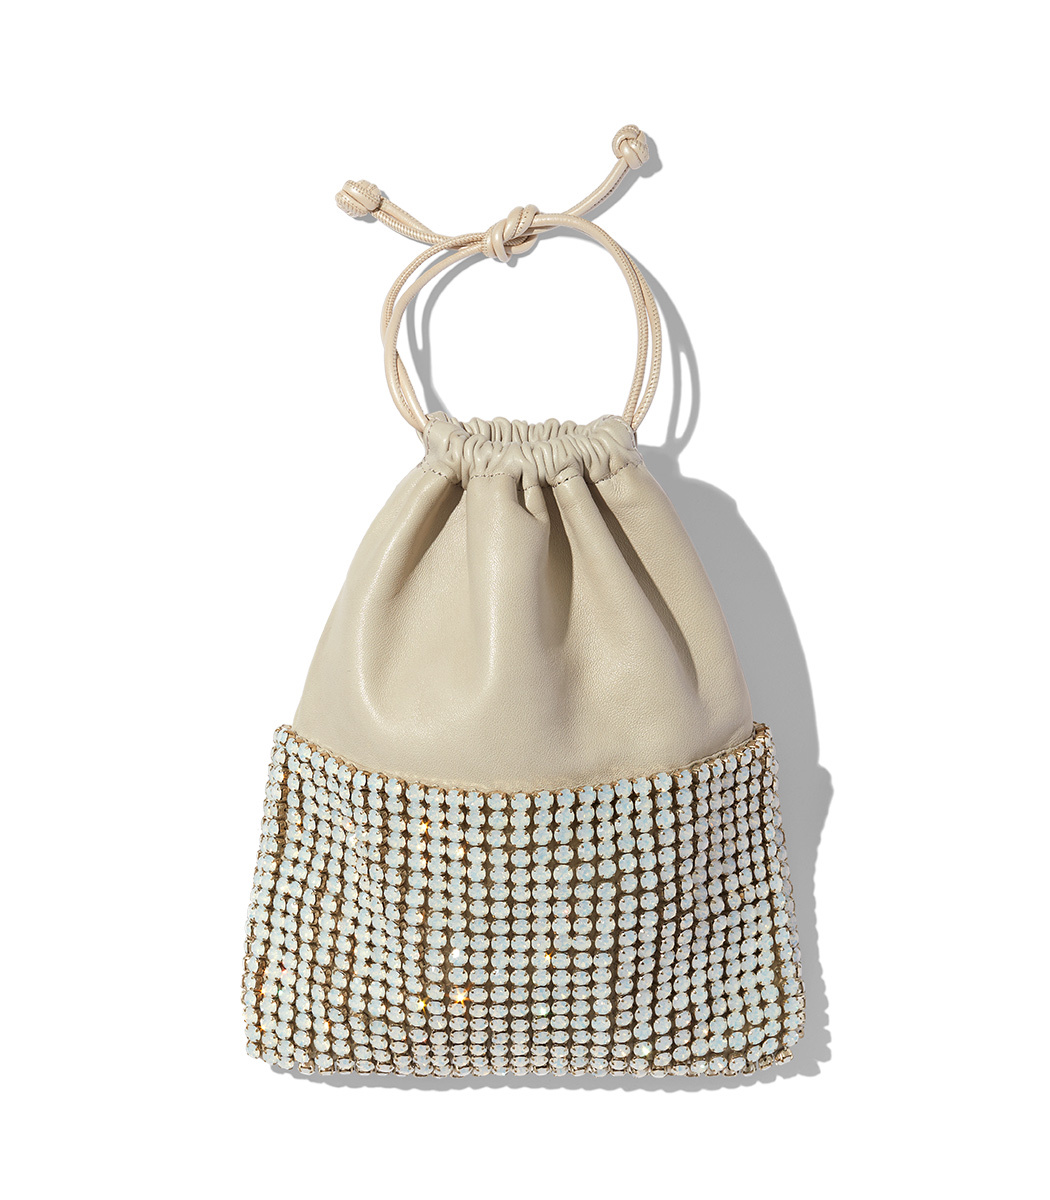 Ryan Crystal-Studded Drawstring Pouch Bag in Ivorybone